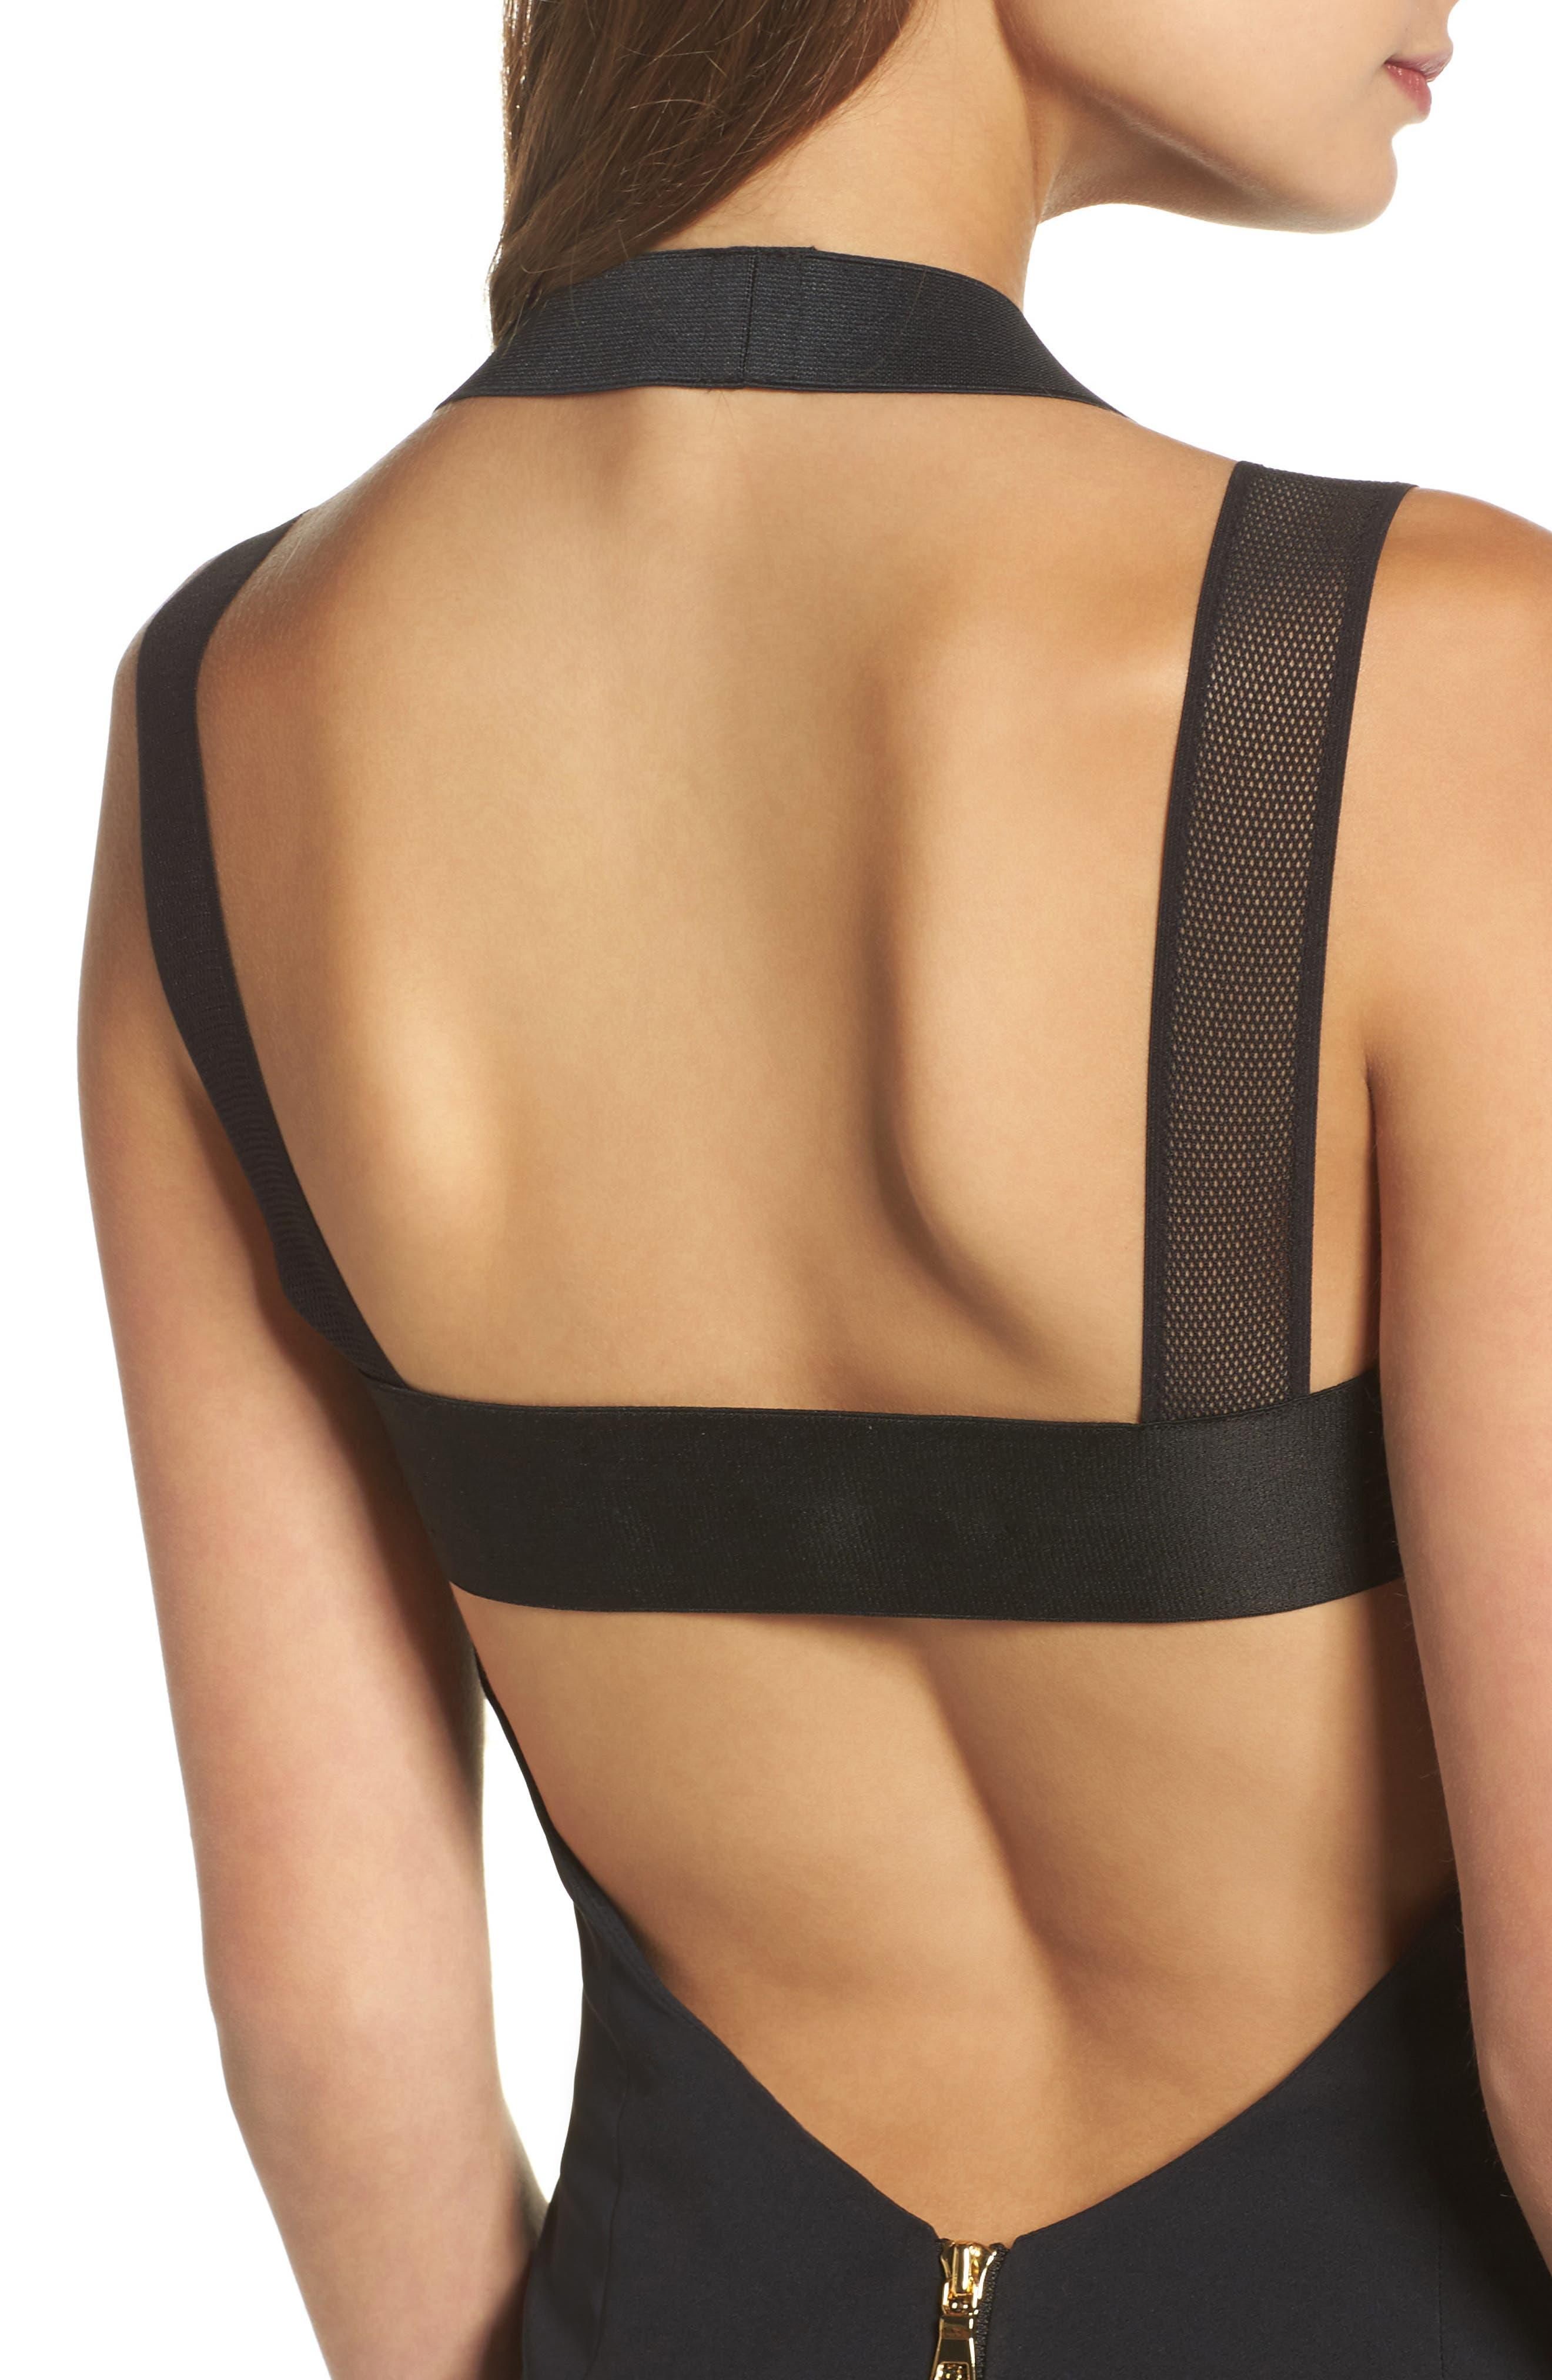 Kendra Elastic Strap Low Back Sheath Dress,                             Alternate thumbnail 4, color,                             Black